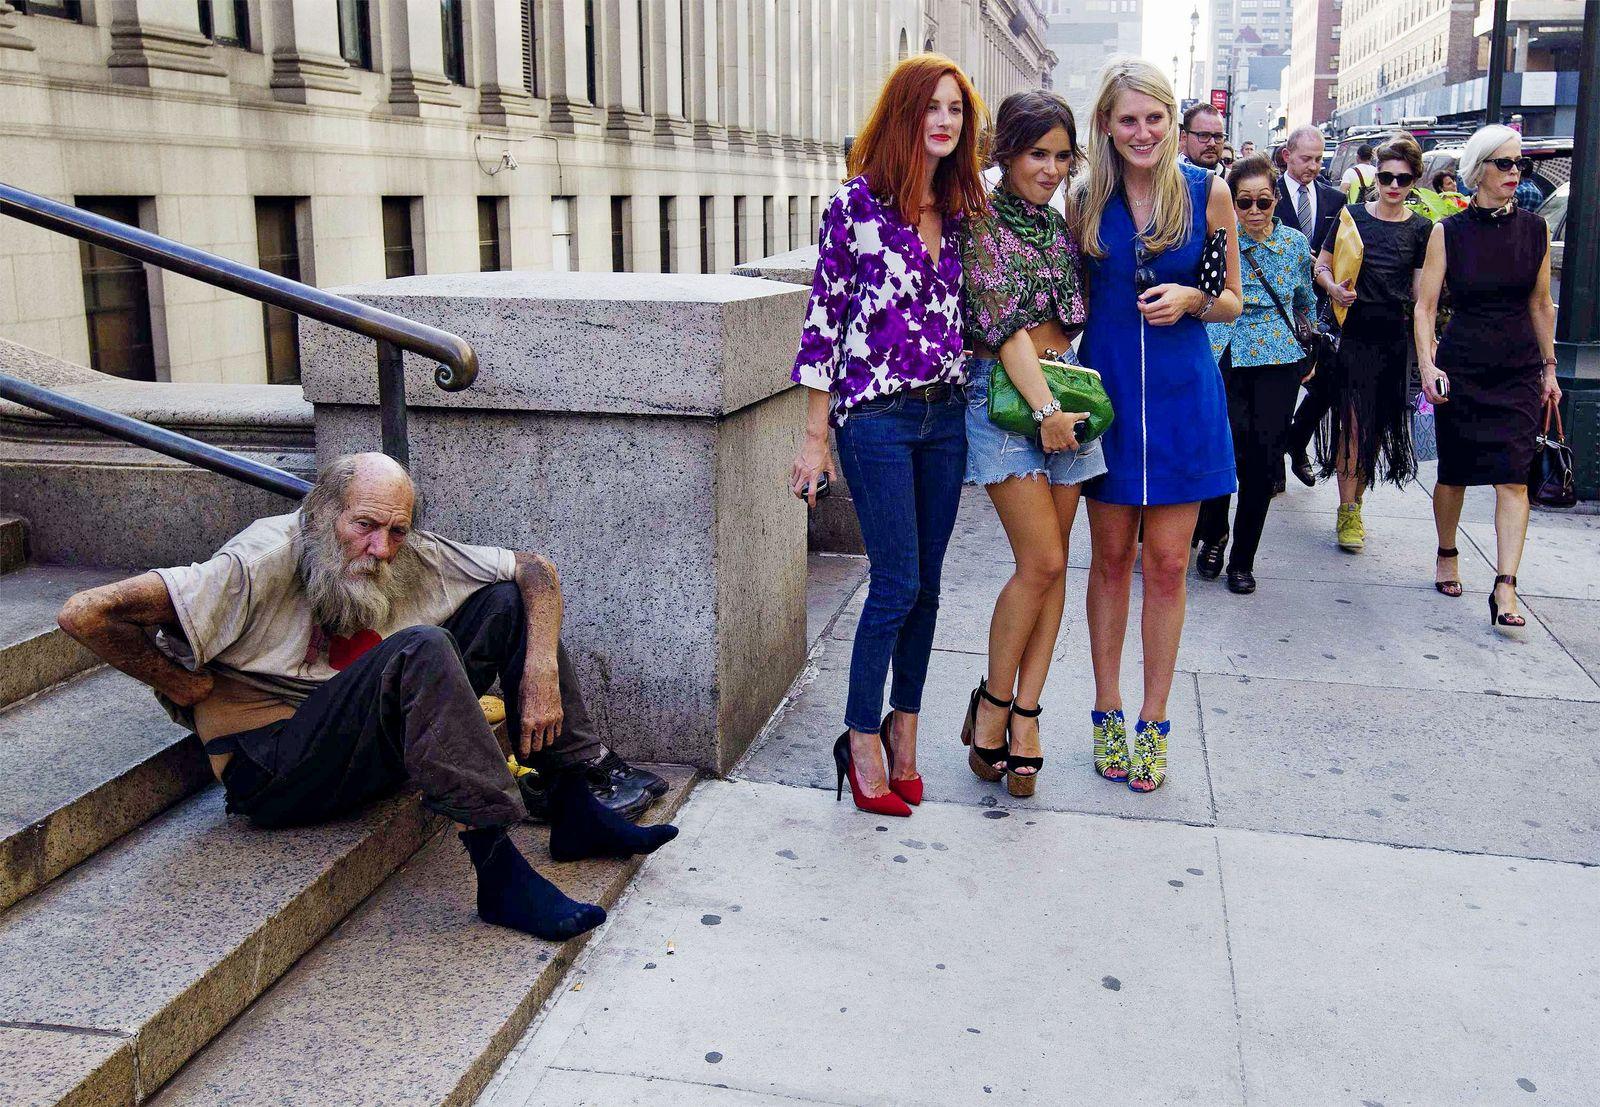 SPIEGEL 40/2012 pp83 SPIN Fashion New York Homeless Man